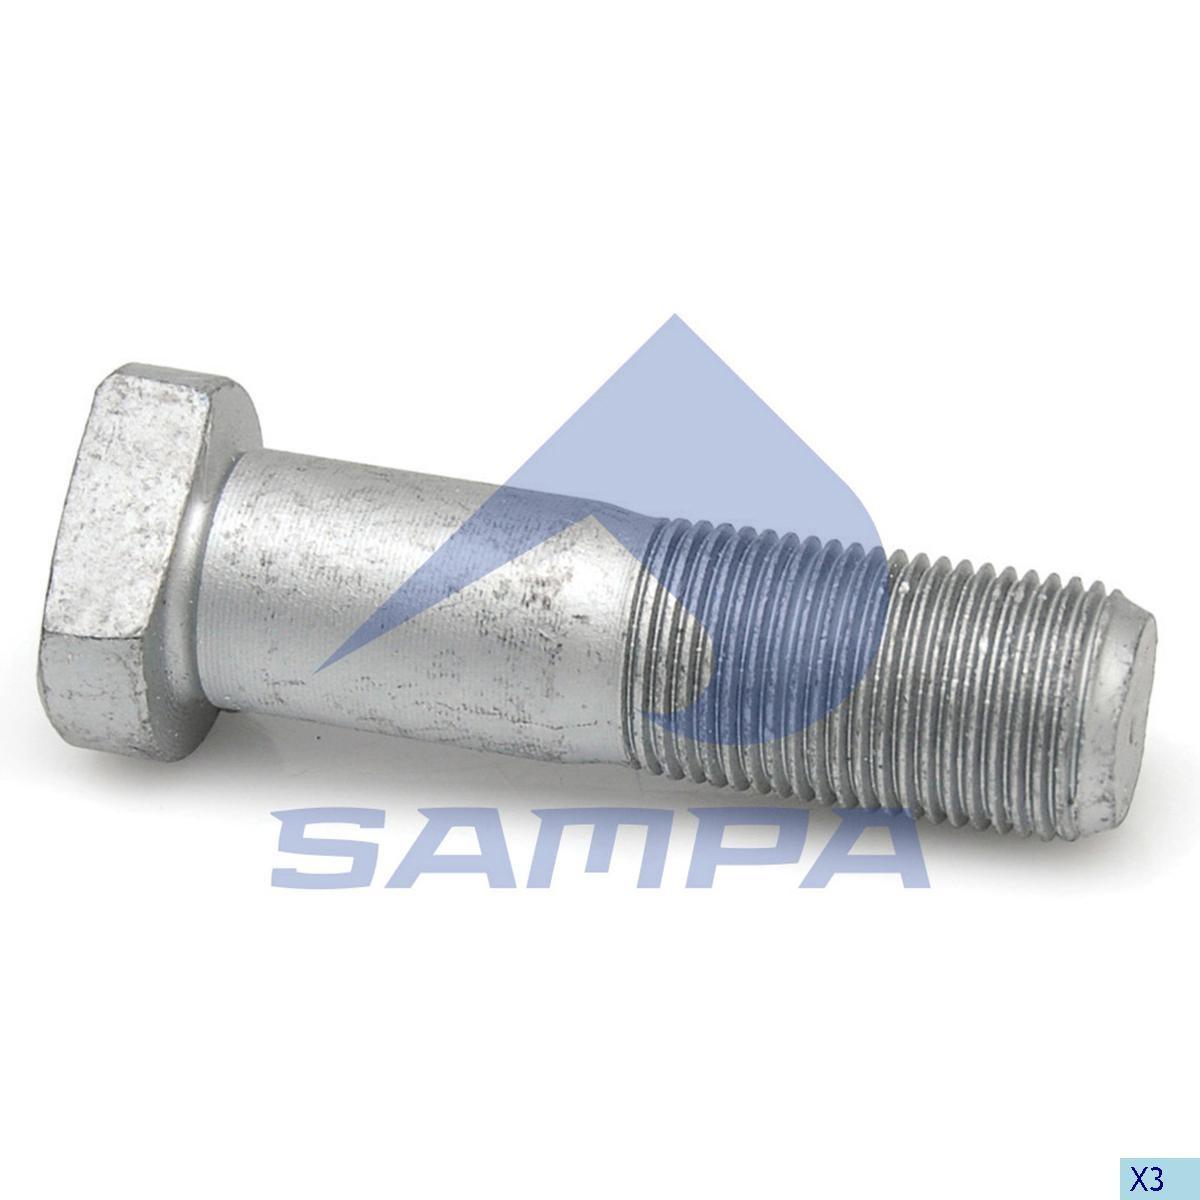 Bolt roata MB 814 М18х1,5 65мм photo